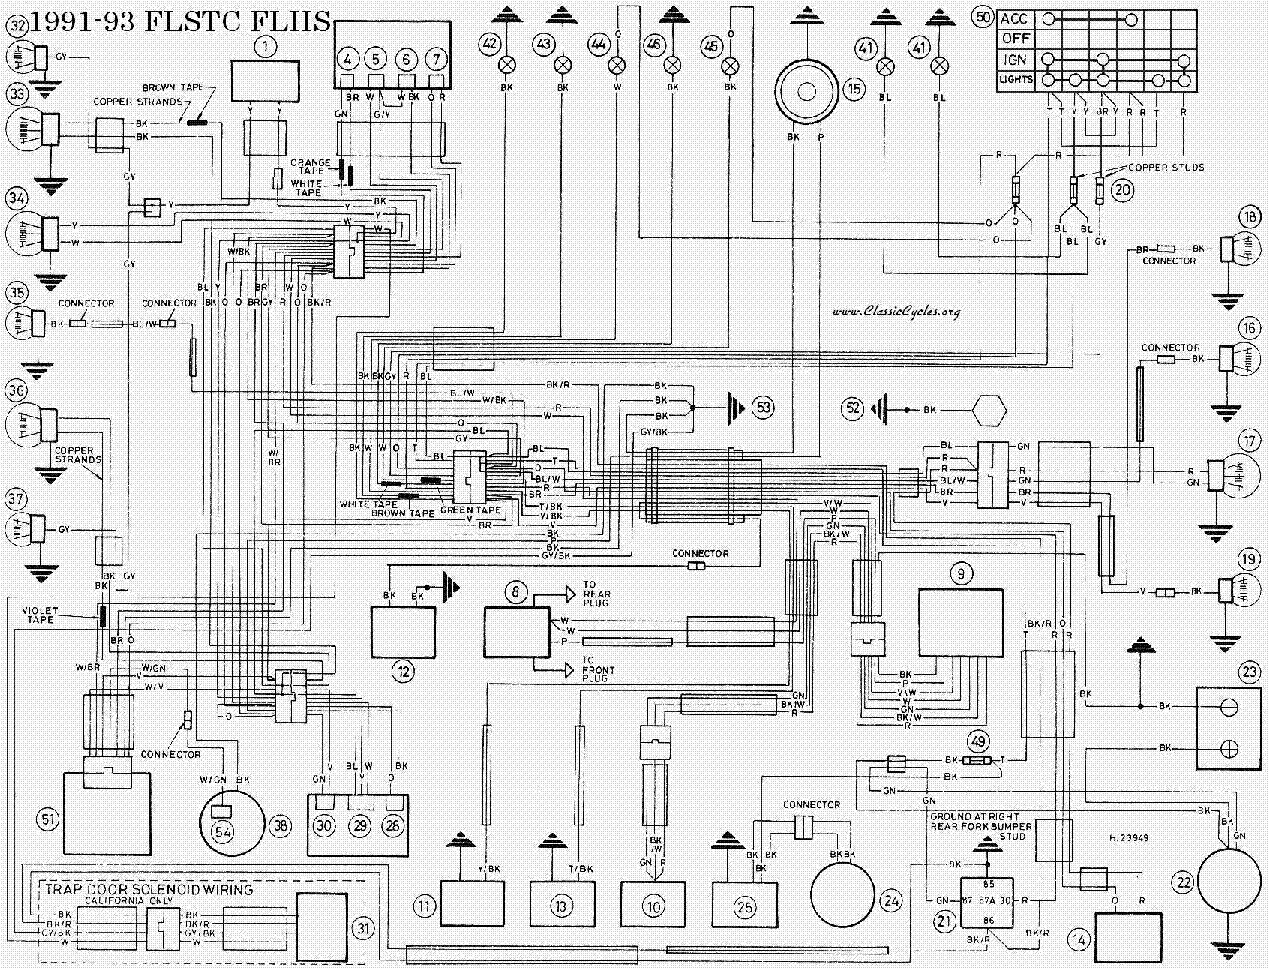 Wiring Diagram Draw Ford For Trailer Harley Davidson 1991 93 Flstc Flhs Service